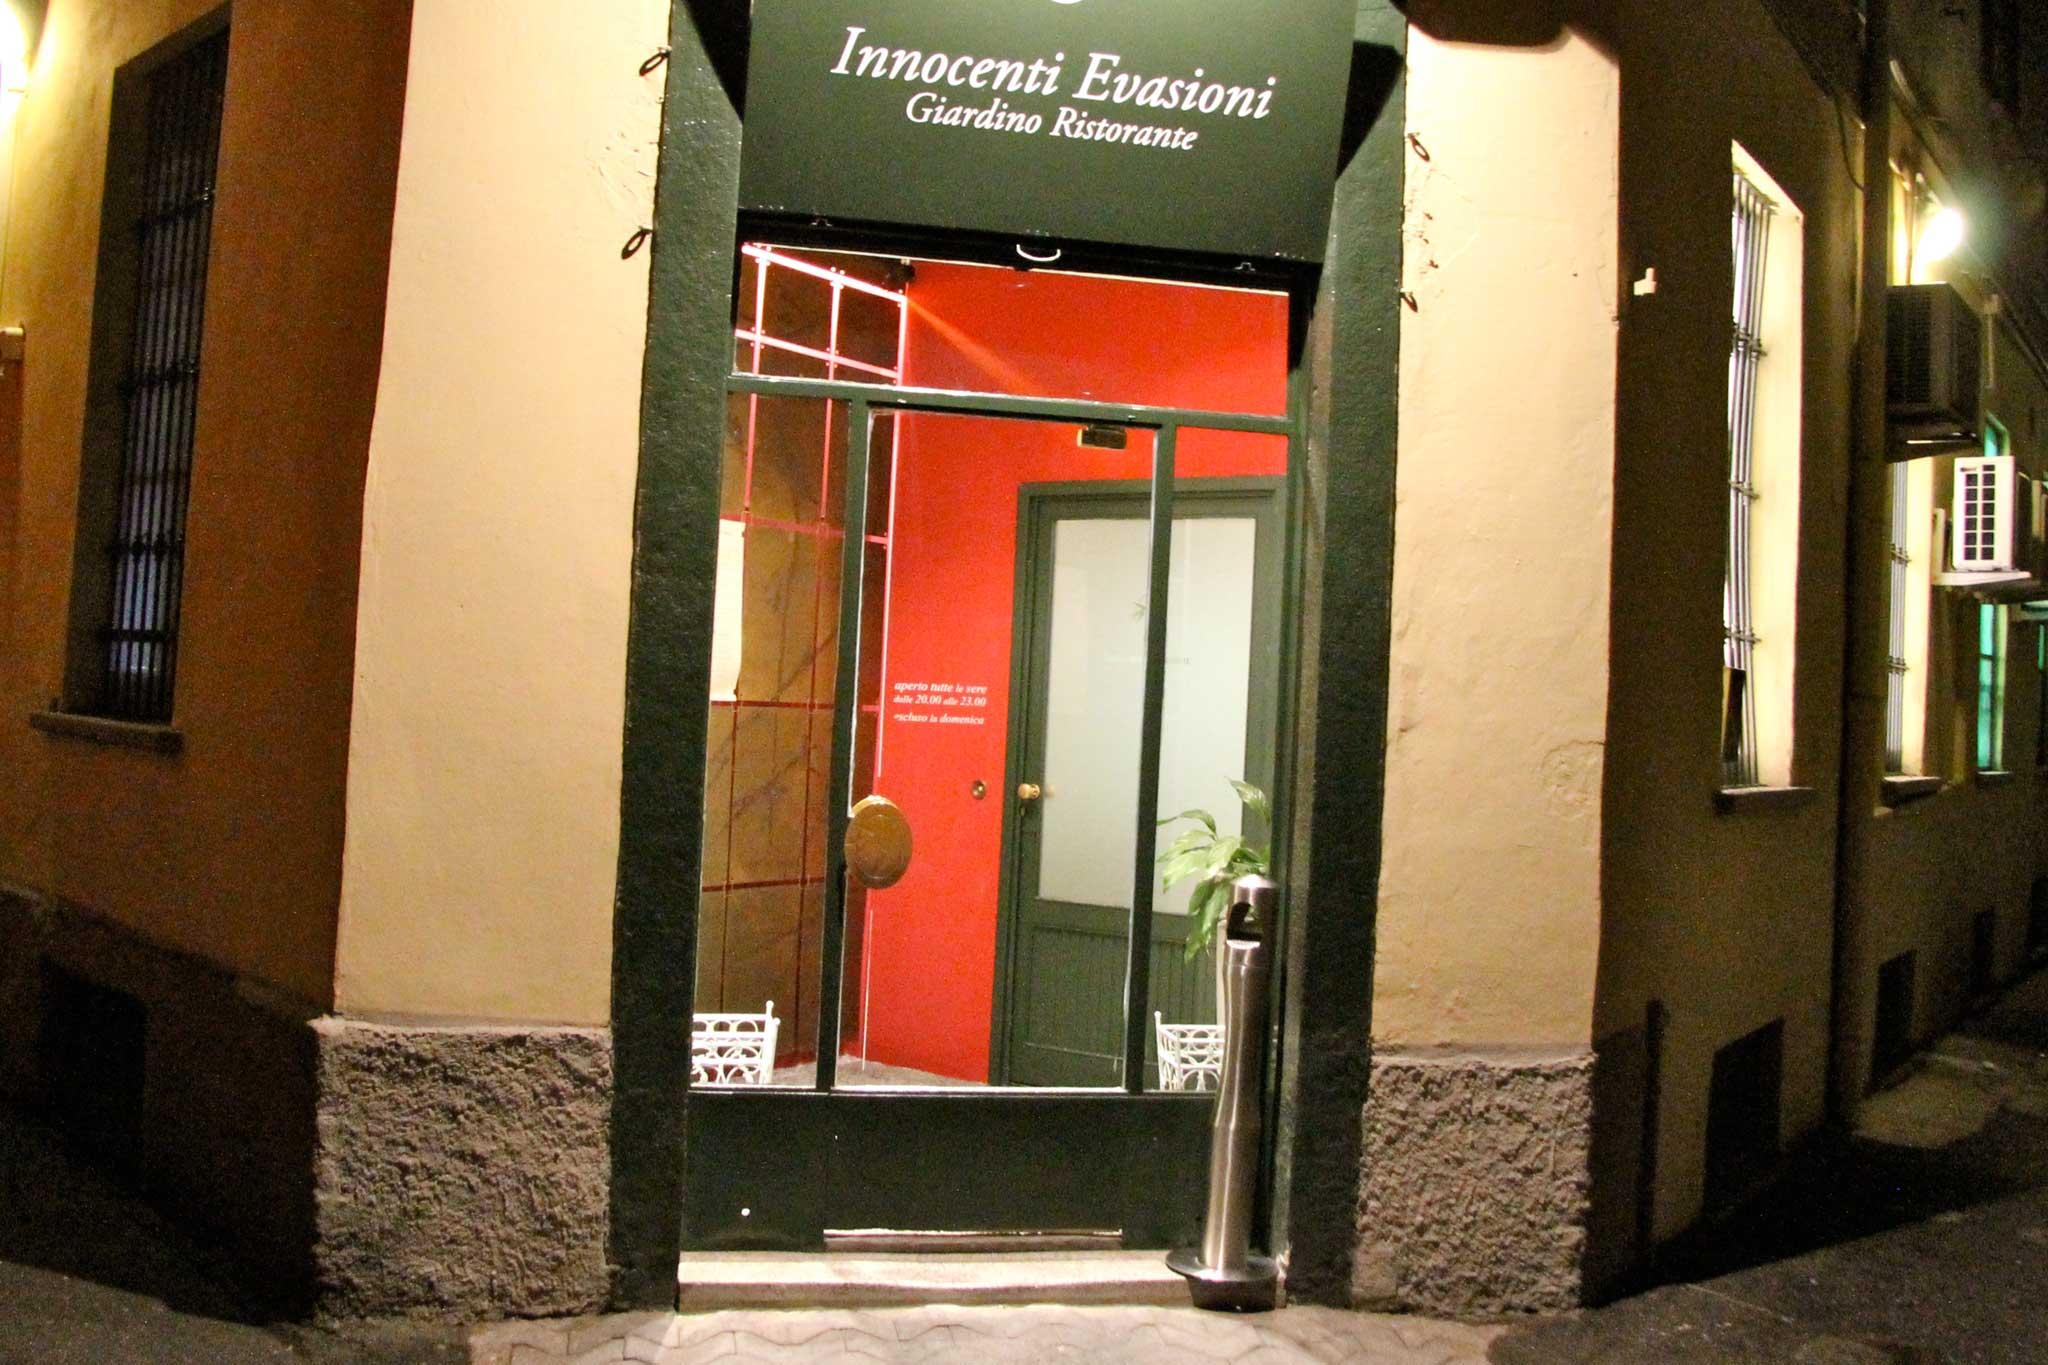 Innocenti Evasioni ristorante Milano